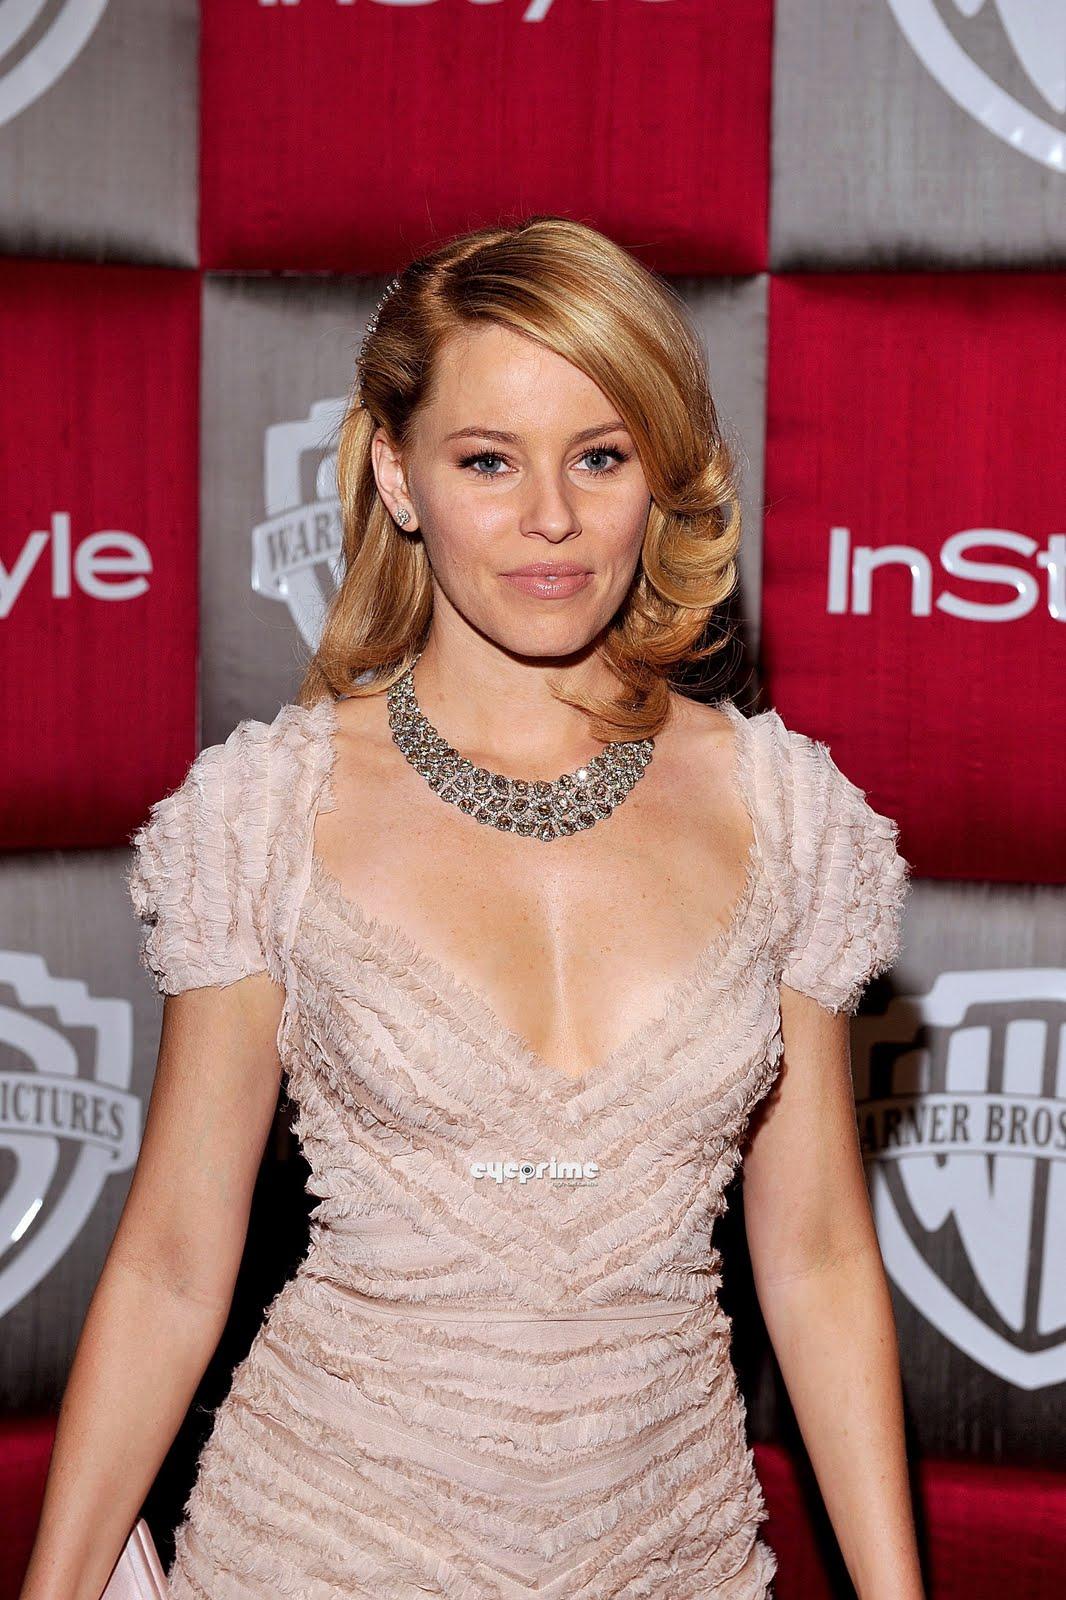 http://2.bp.blogspot.com/_6A8j2EQmANk/S8hQoU2OtrI/AAAAAAAAB34/zXWisQXvTf4/s1600/Elizabeth+Banks10.jpg